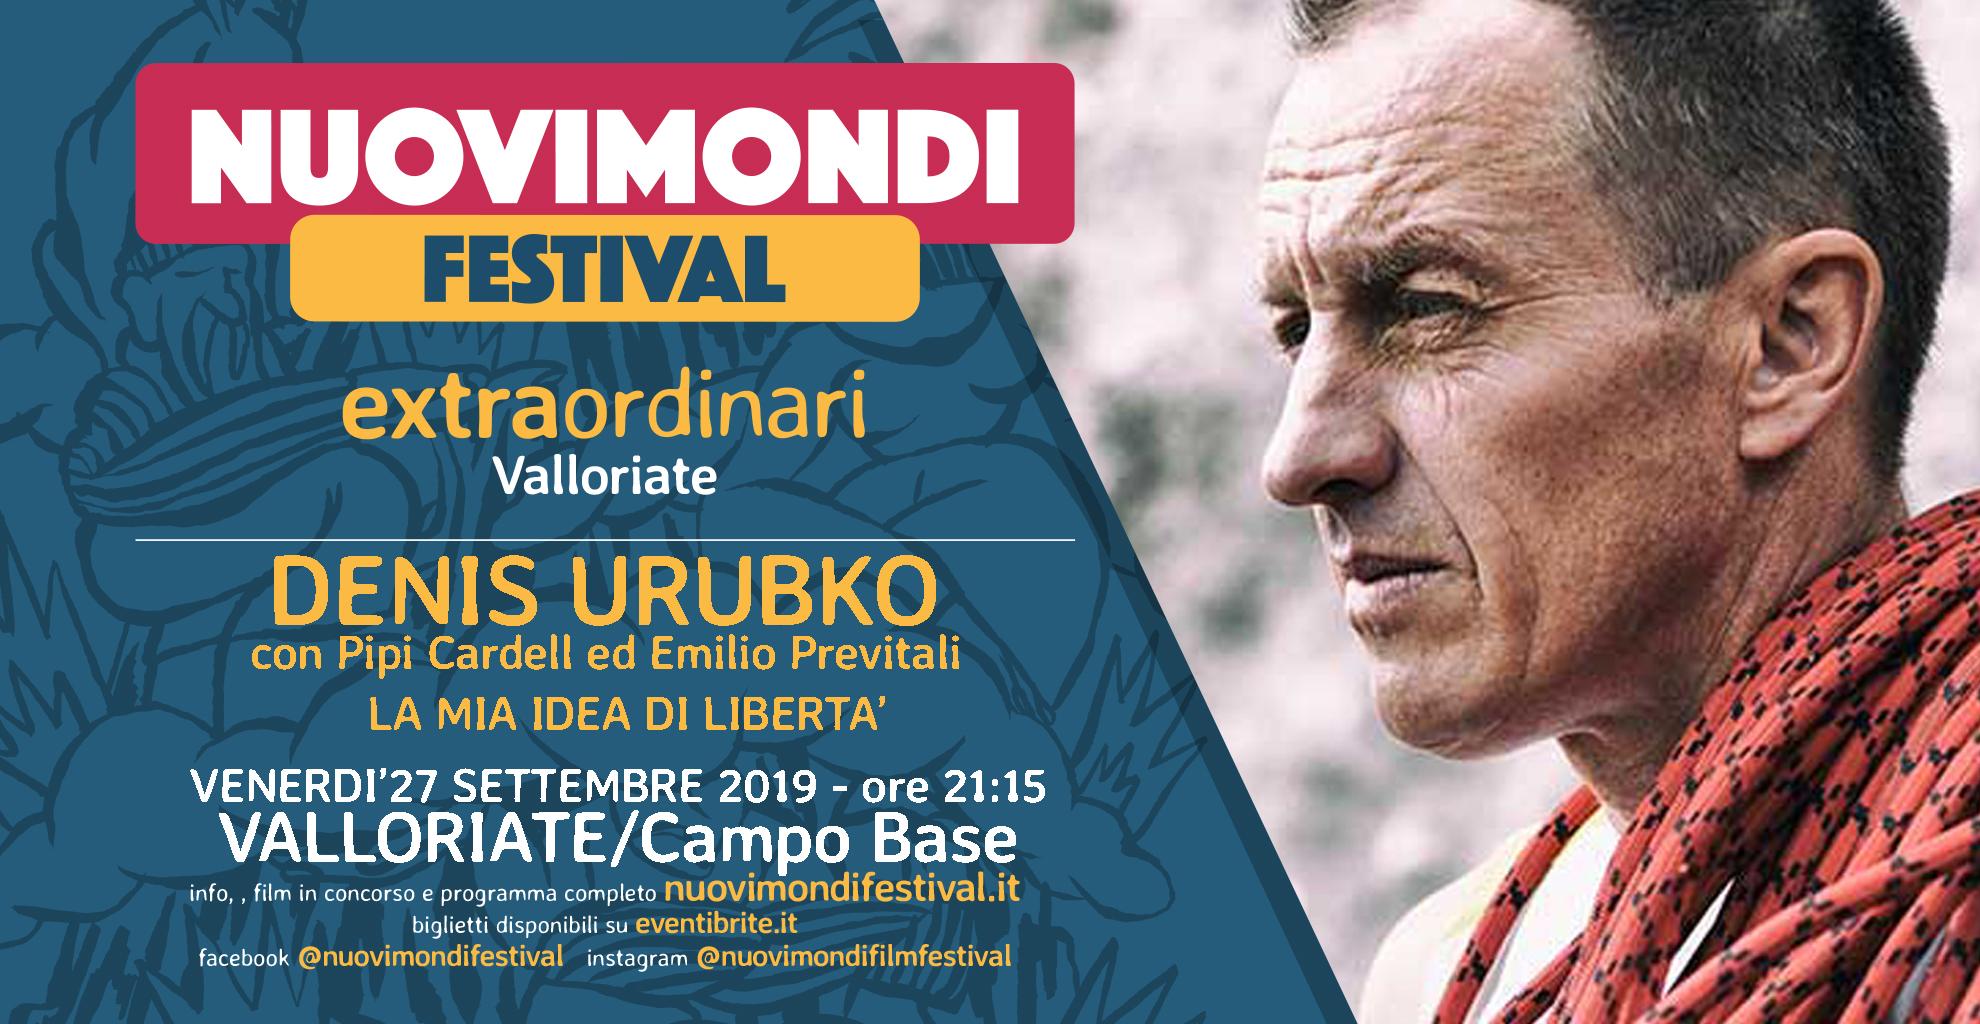 NuoviMondi_Facebook-Denis-Urubko